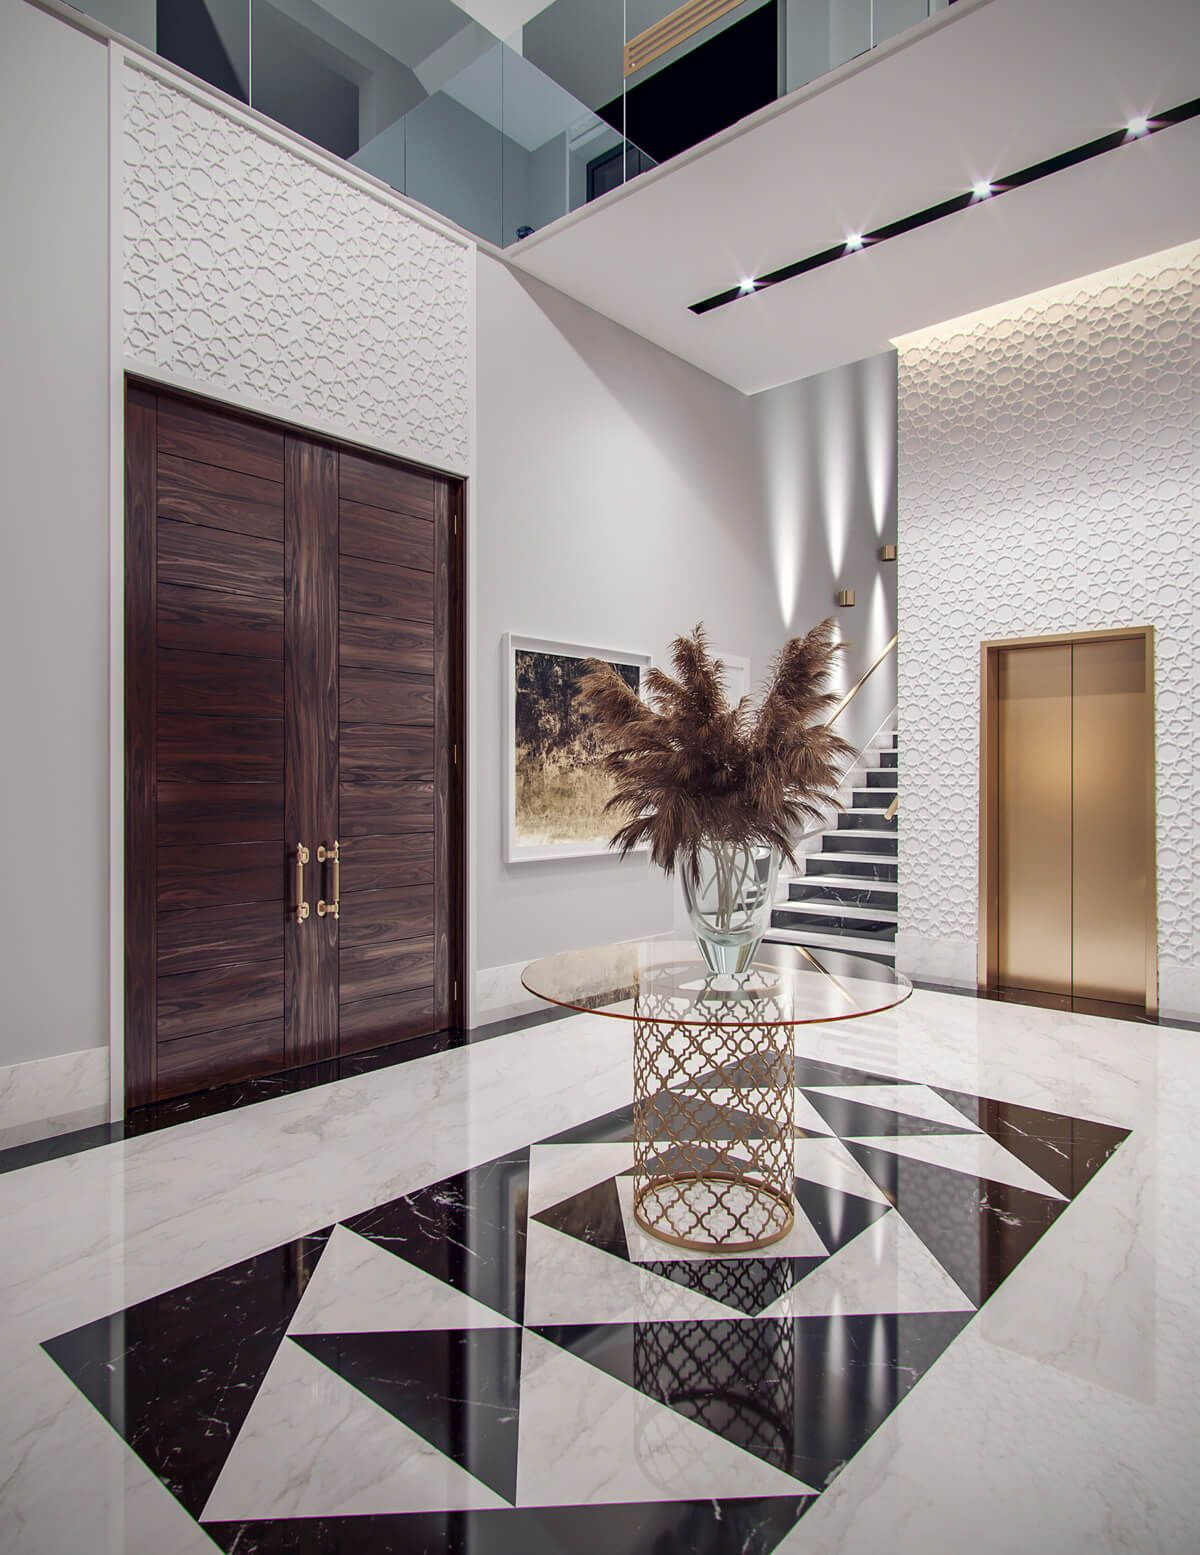 Family Villa Contemporary Arabic Interior Design Riyadh Saudi